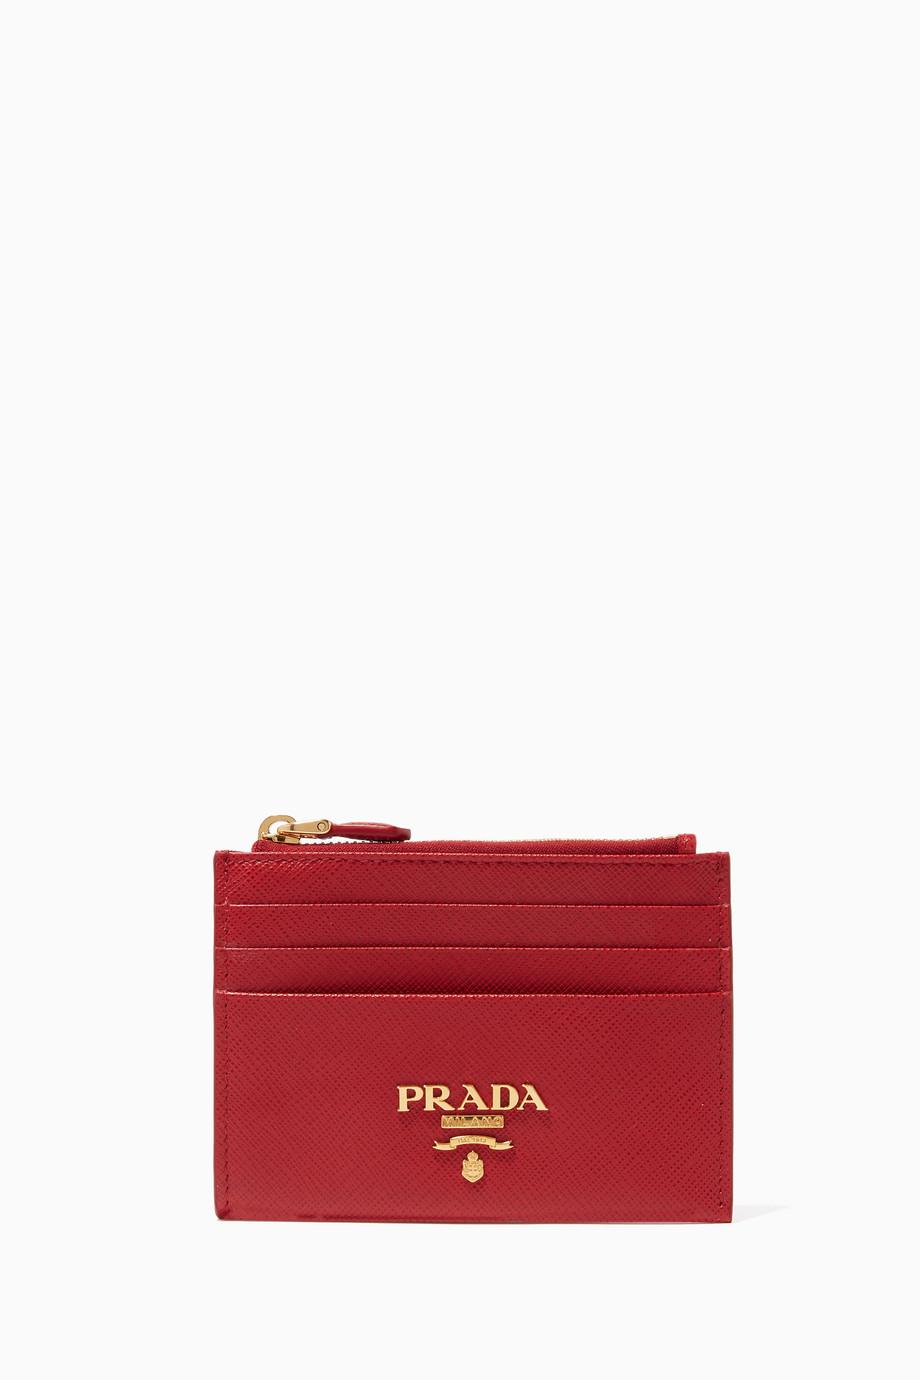 80ef6772561359 Shop Prada Red Saffiano Leather Card Case for Women   Ounass